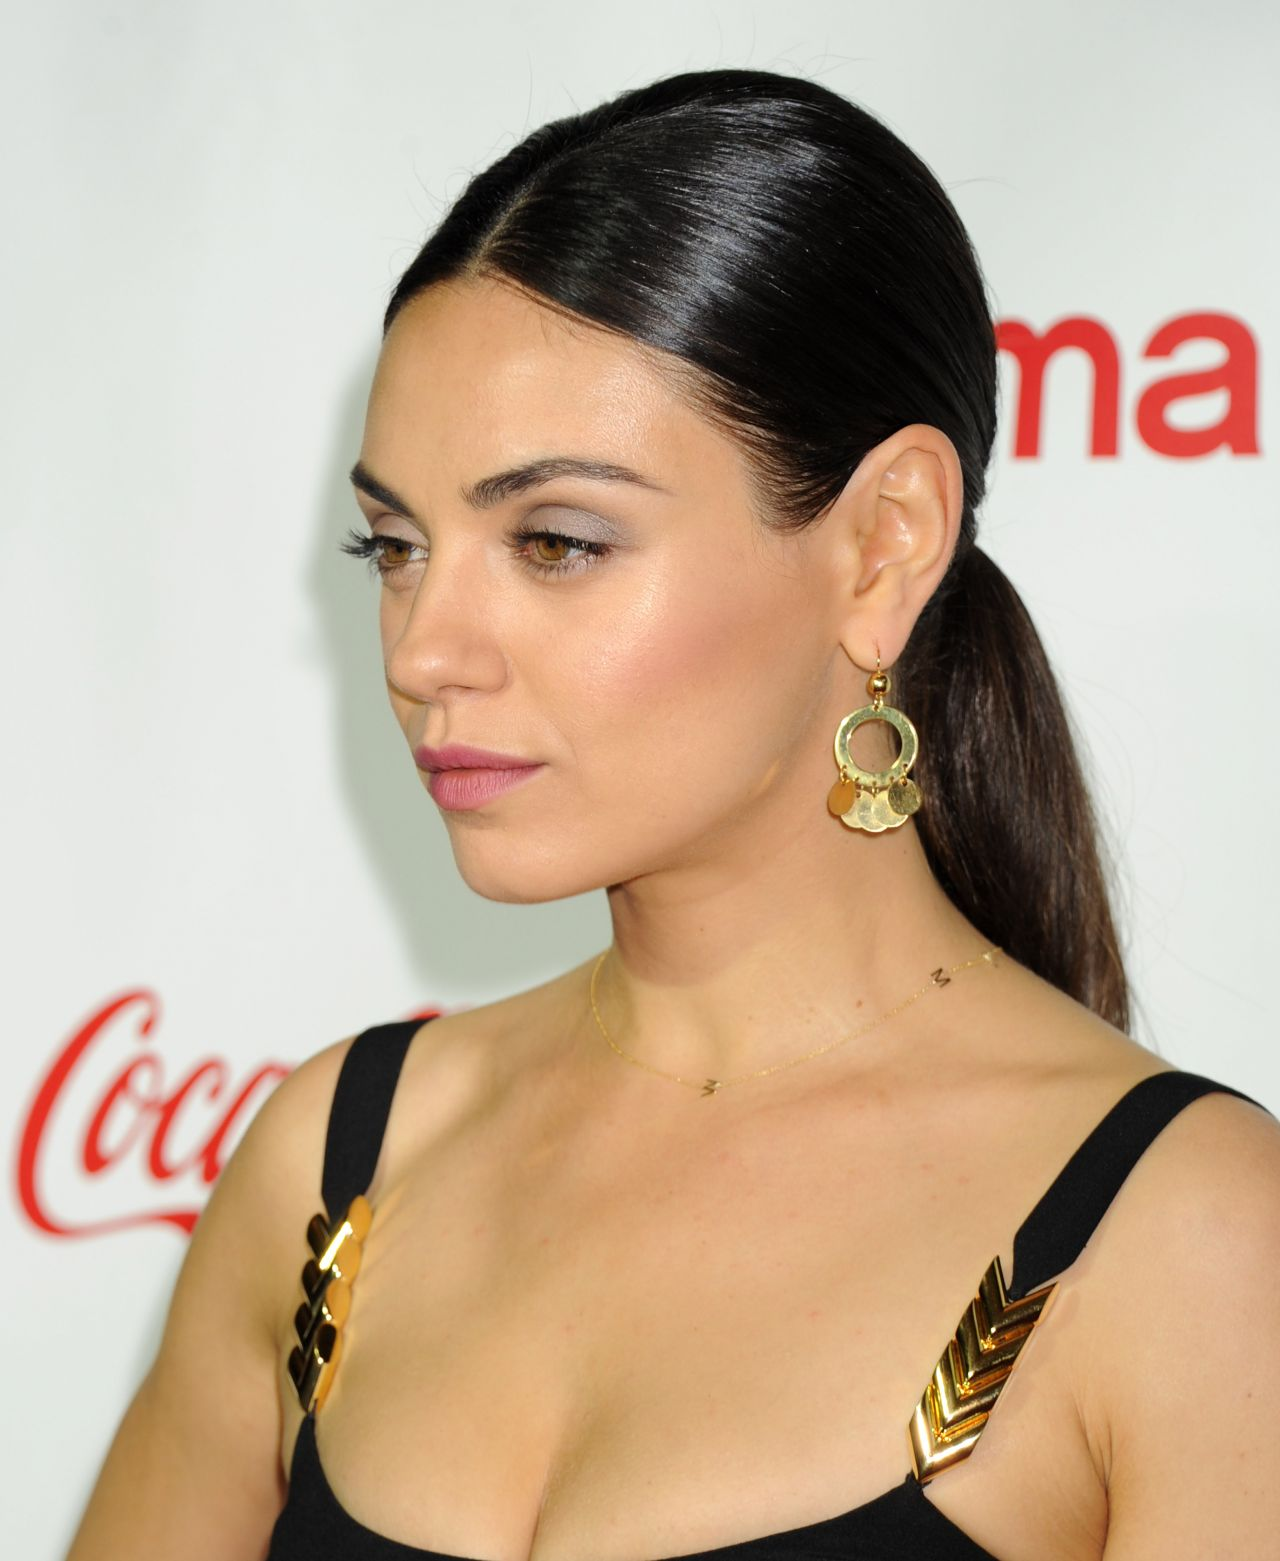 Mila Kunis Big Screen Achievement Awards CinemaCon